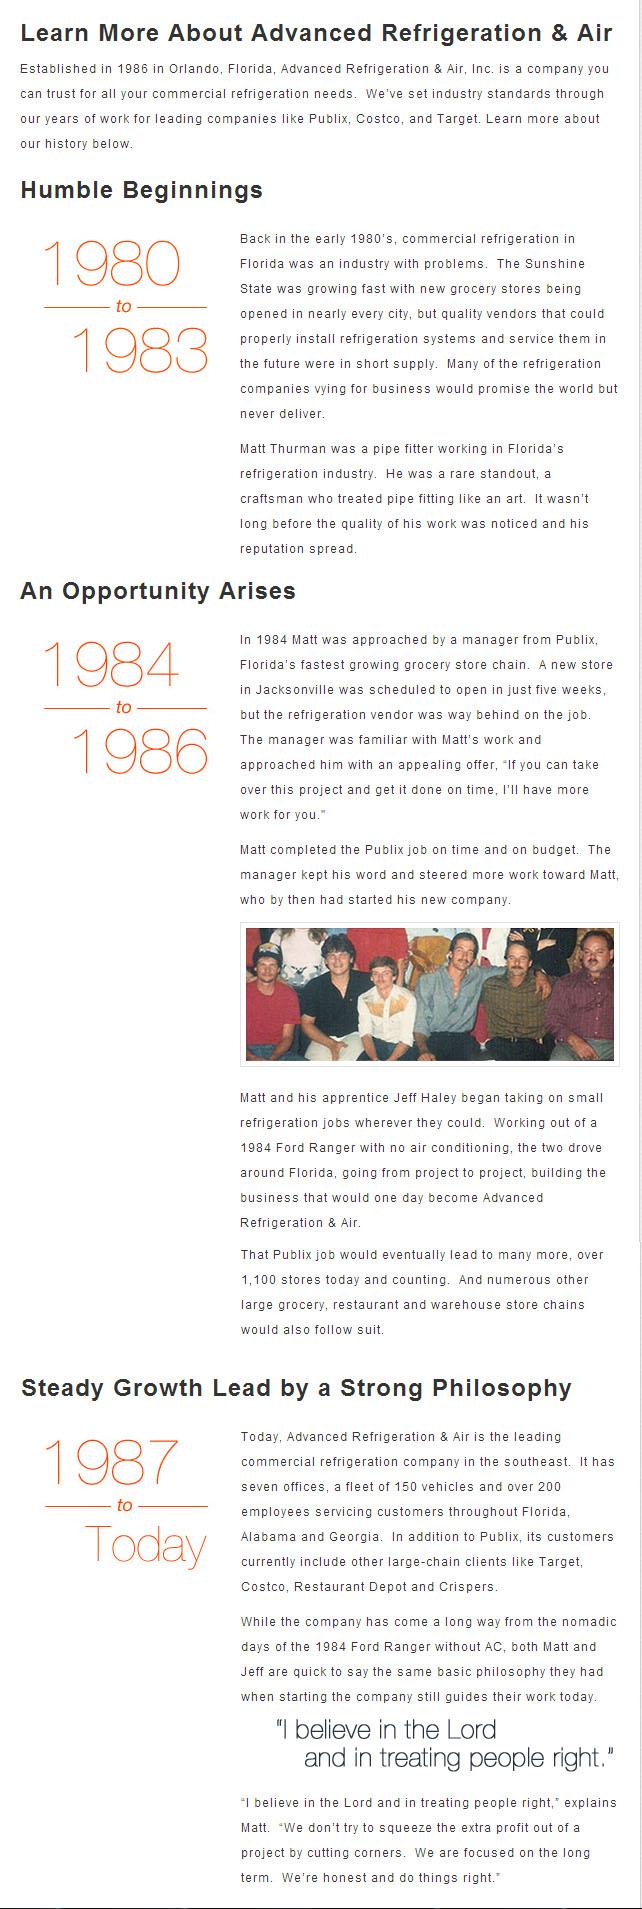 Advanced Refrigeration & Air History